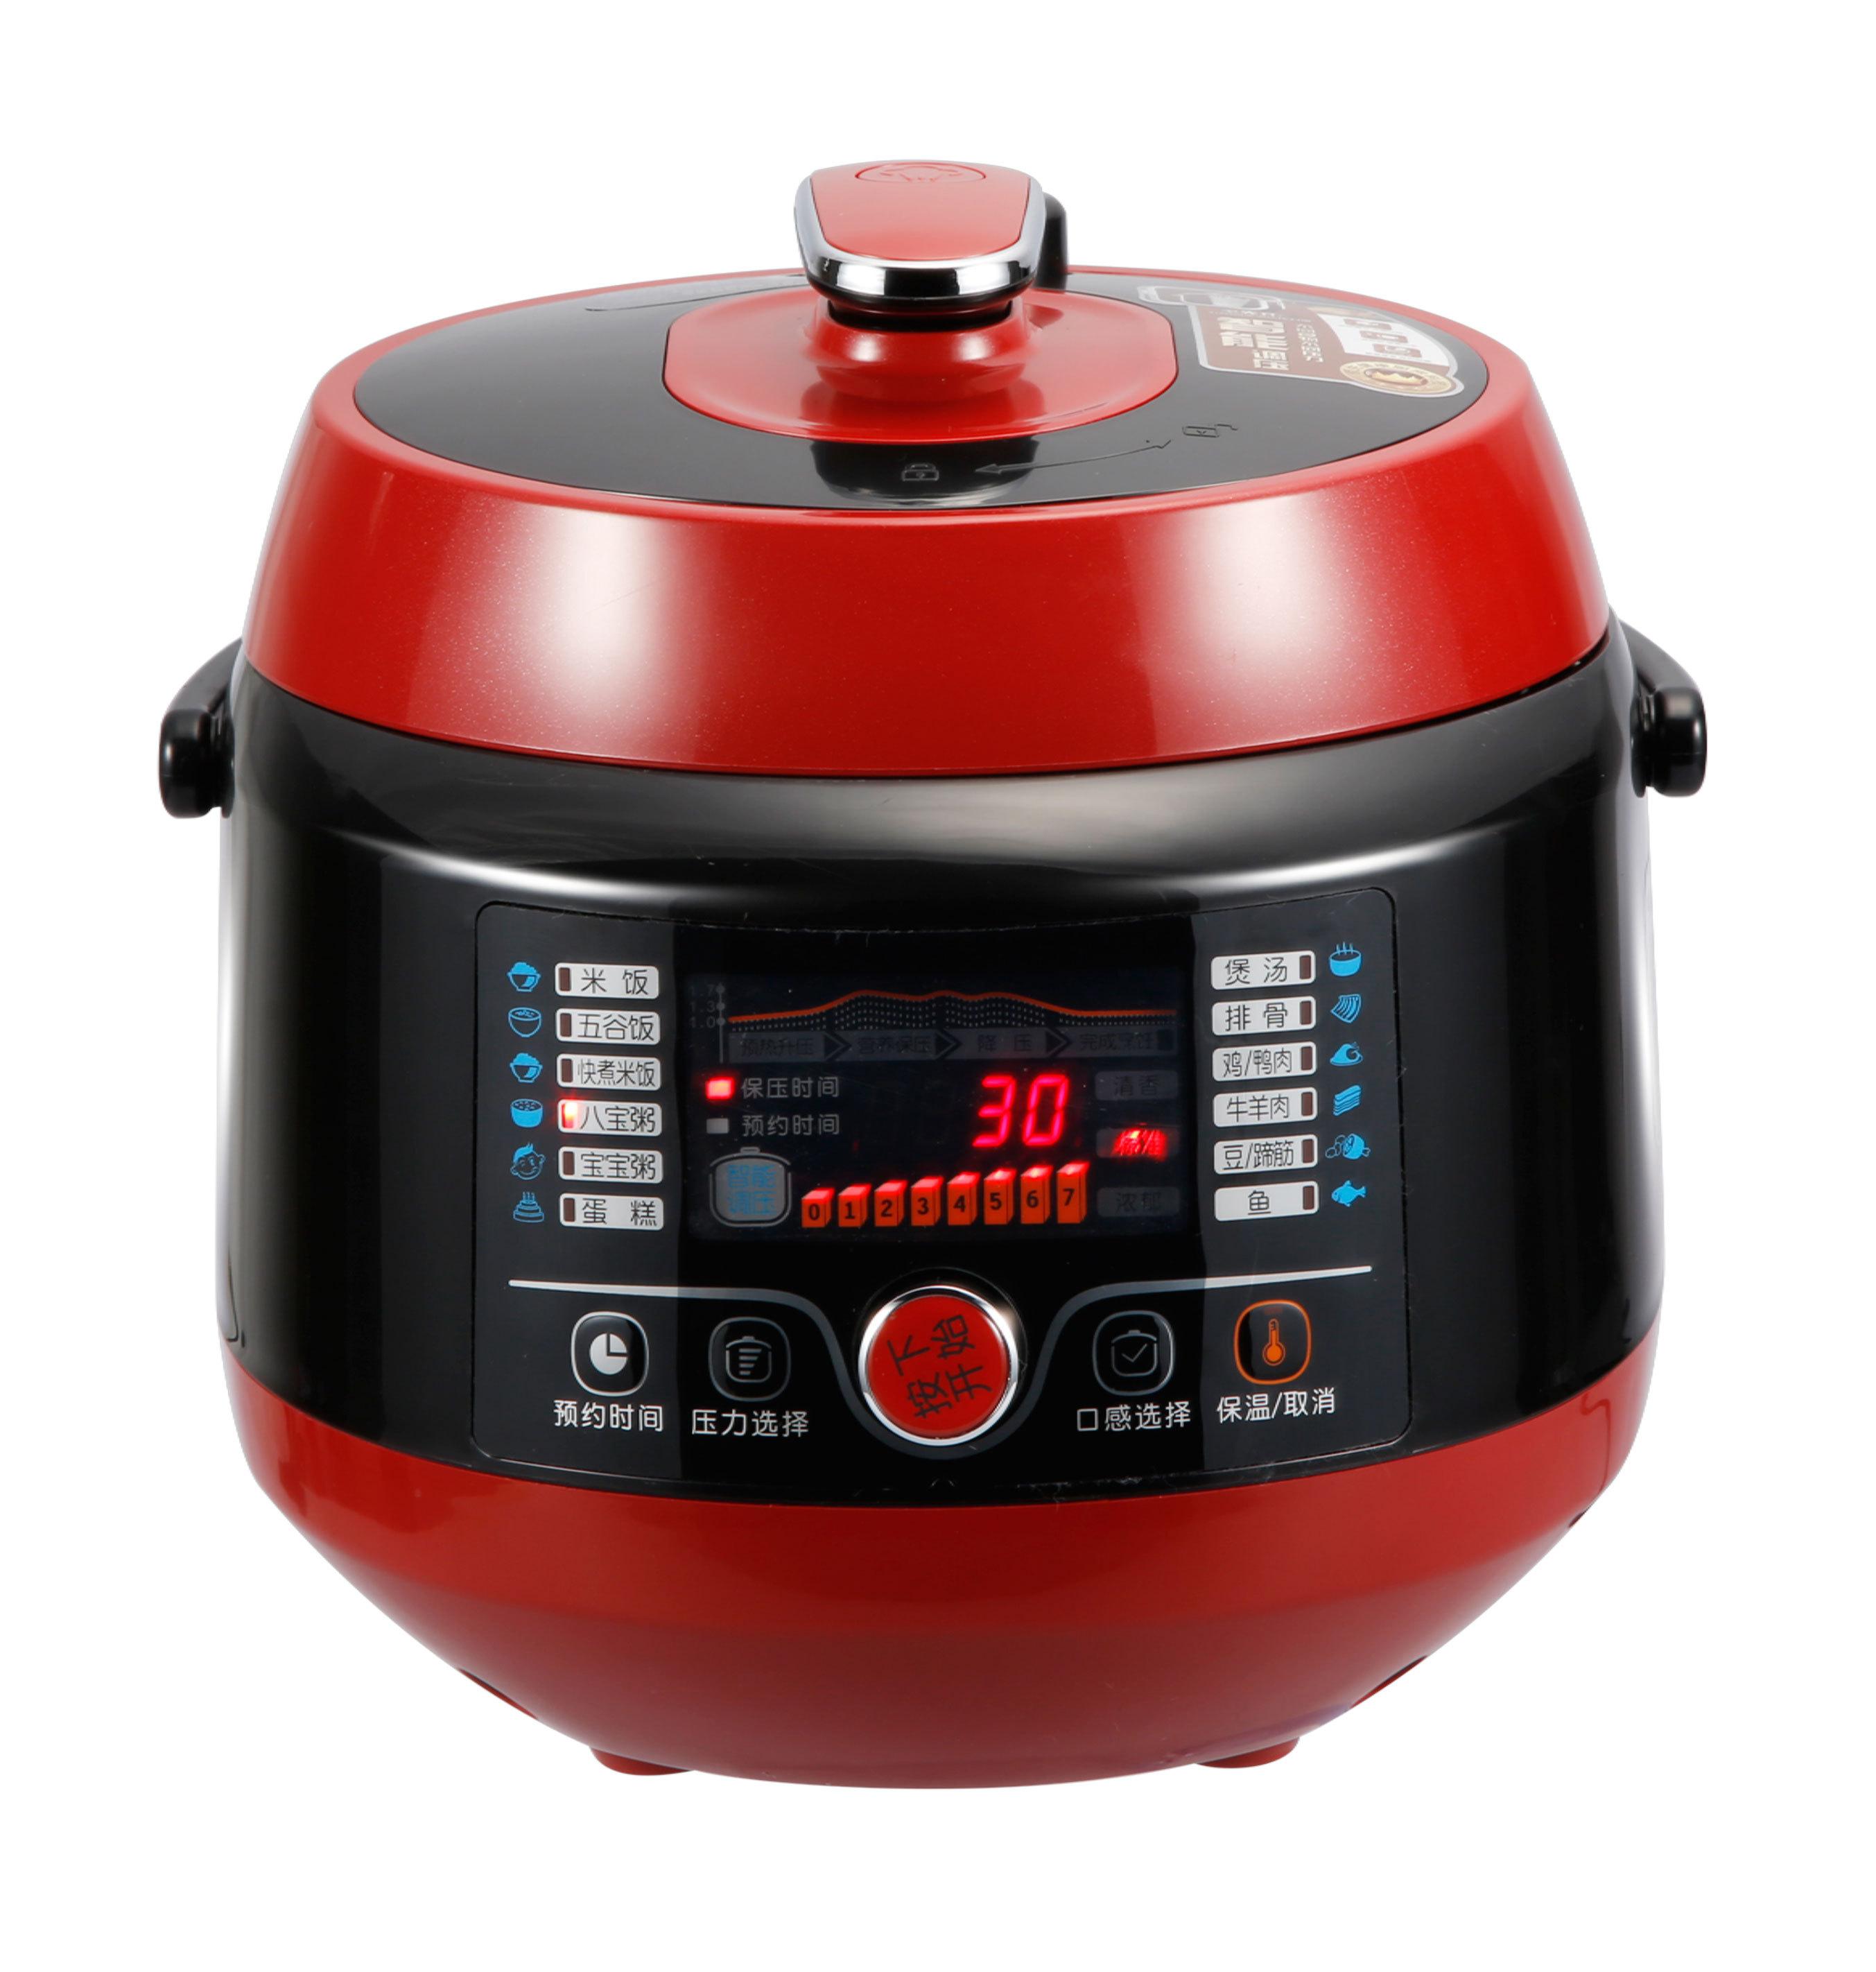 Joyoung/九阳 JYY-50C2电压力锅价格贵吗,好不好